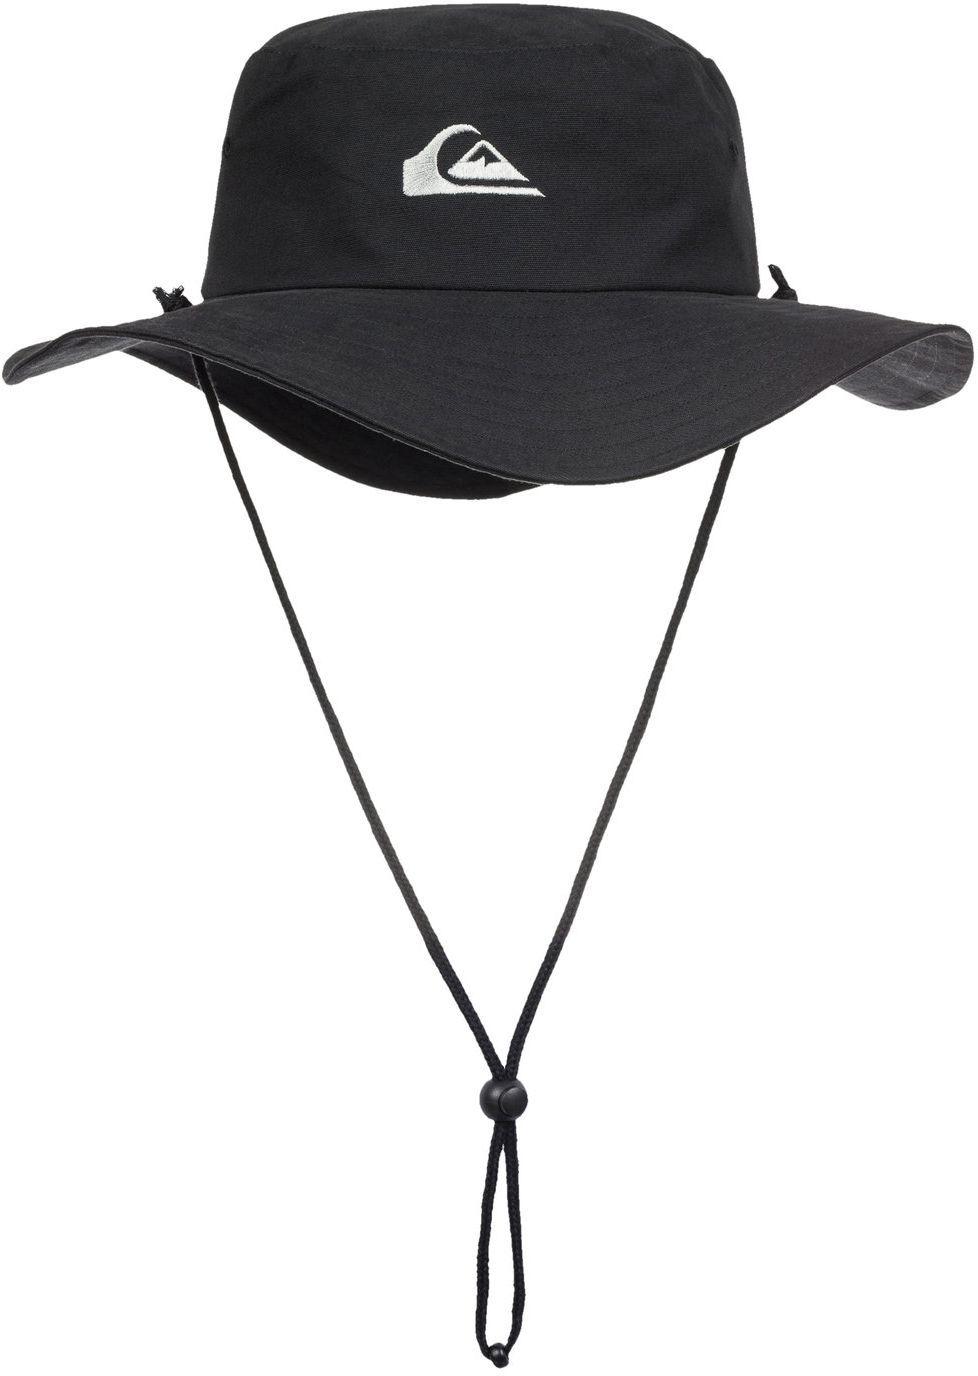 5c9188a4 Quiksilver Men's Bushmaster Safari Hat   Products   Safari hat, Hats ...